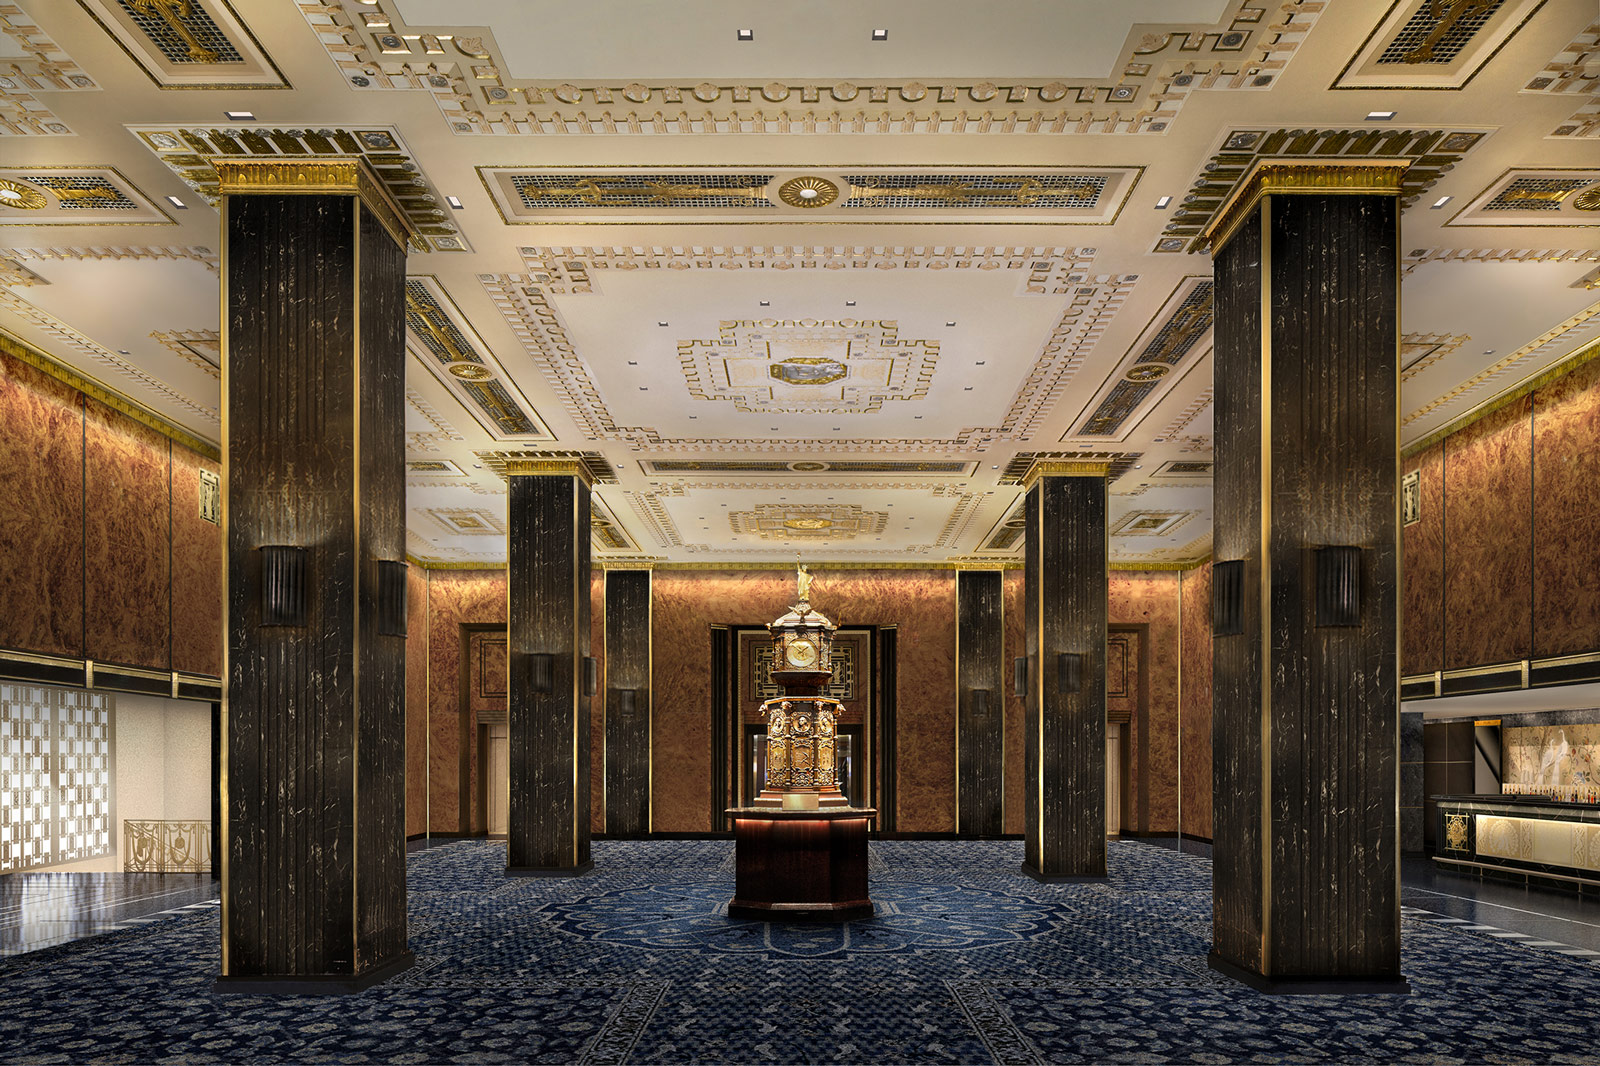 Hilton Hotel London Ceo